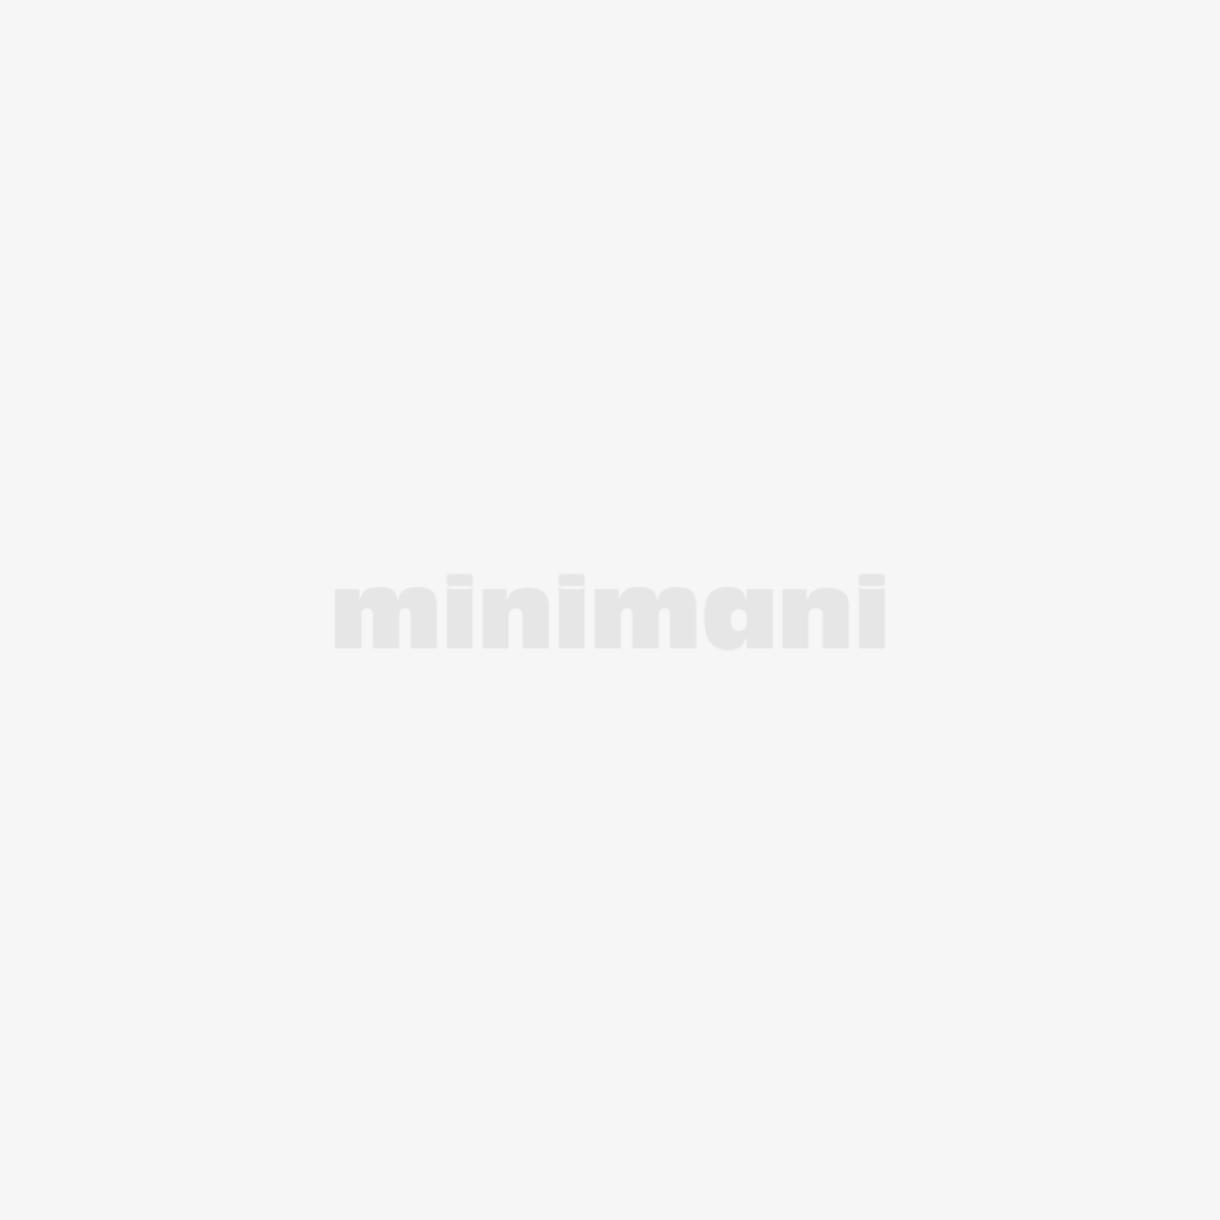 MOONHAMMOCK SINGLE LILA-PINKKI